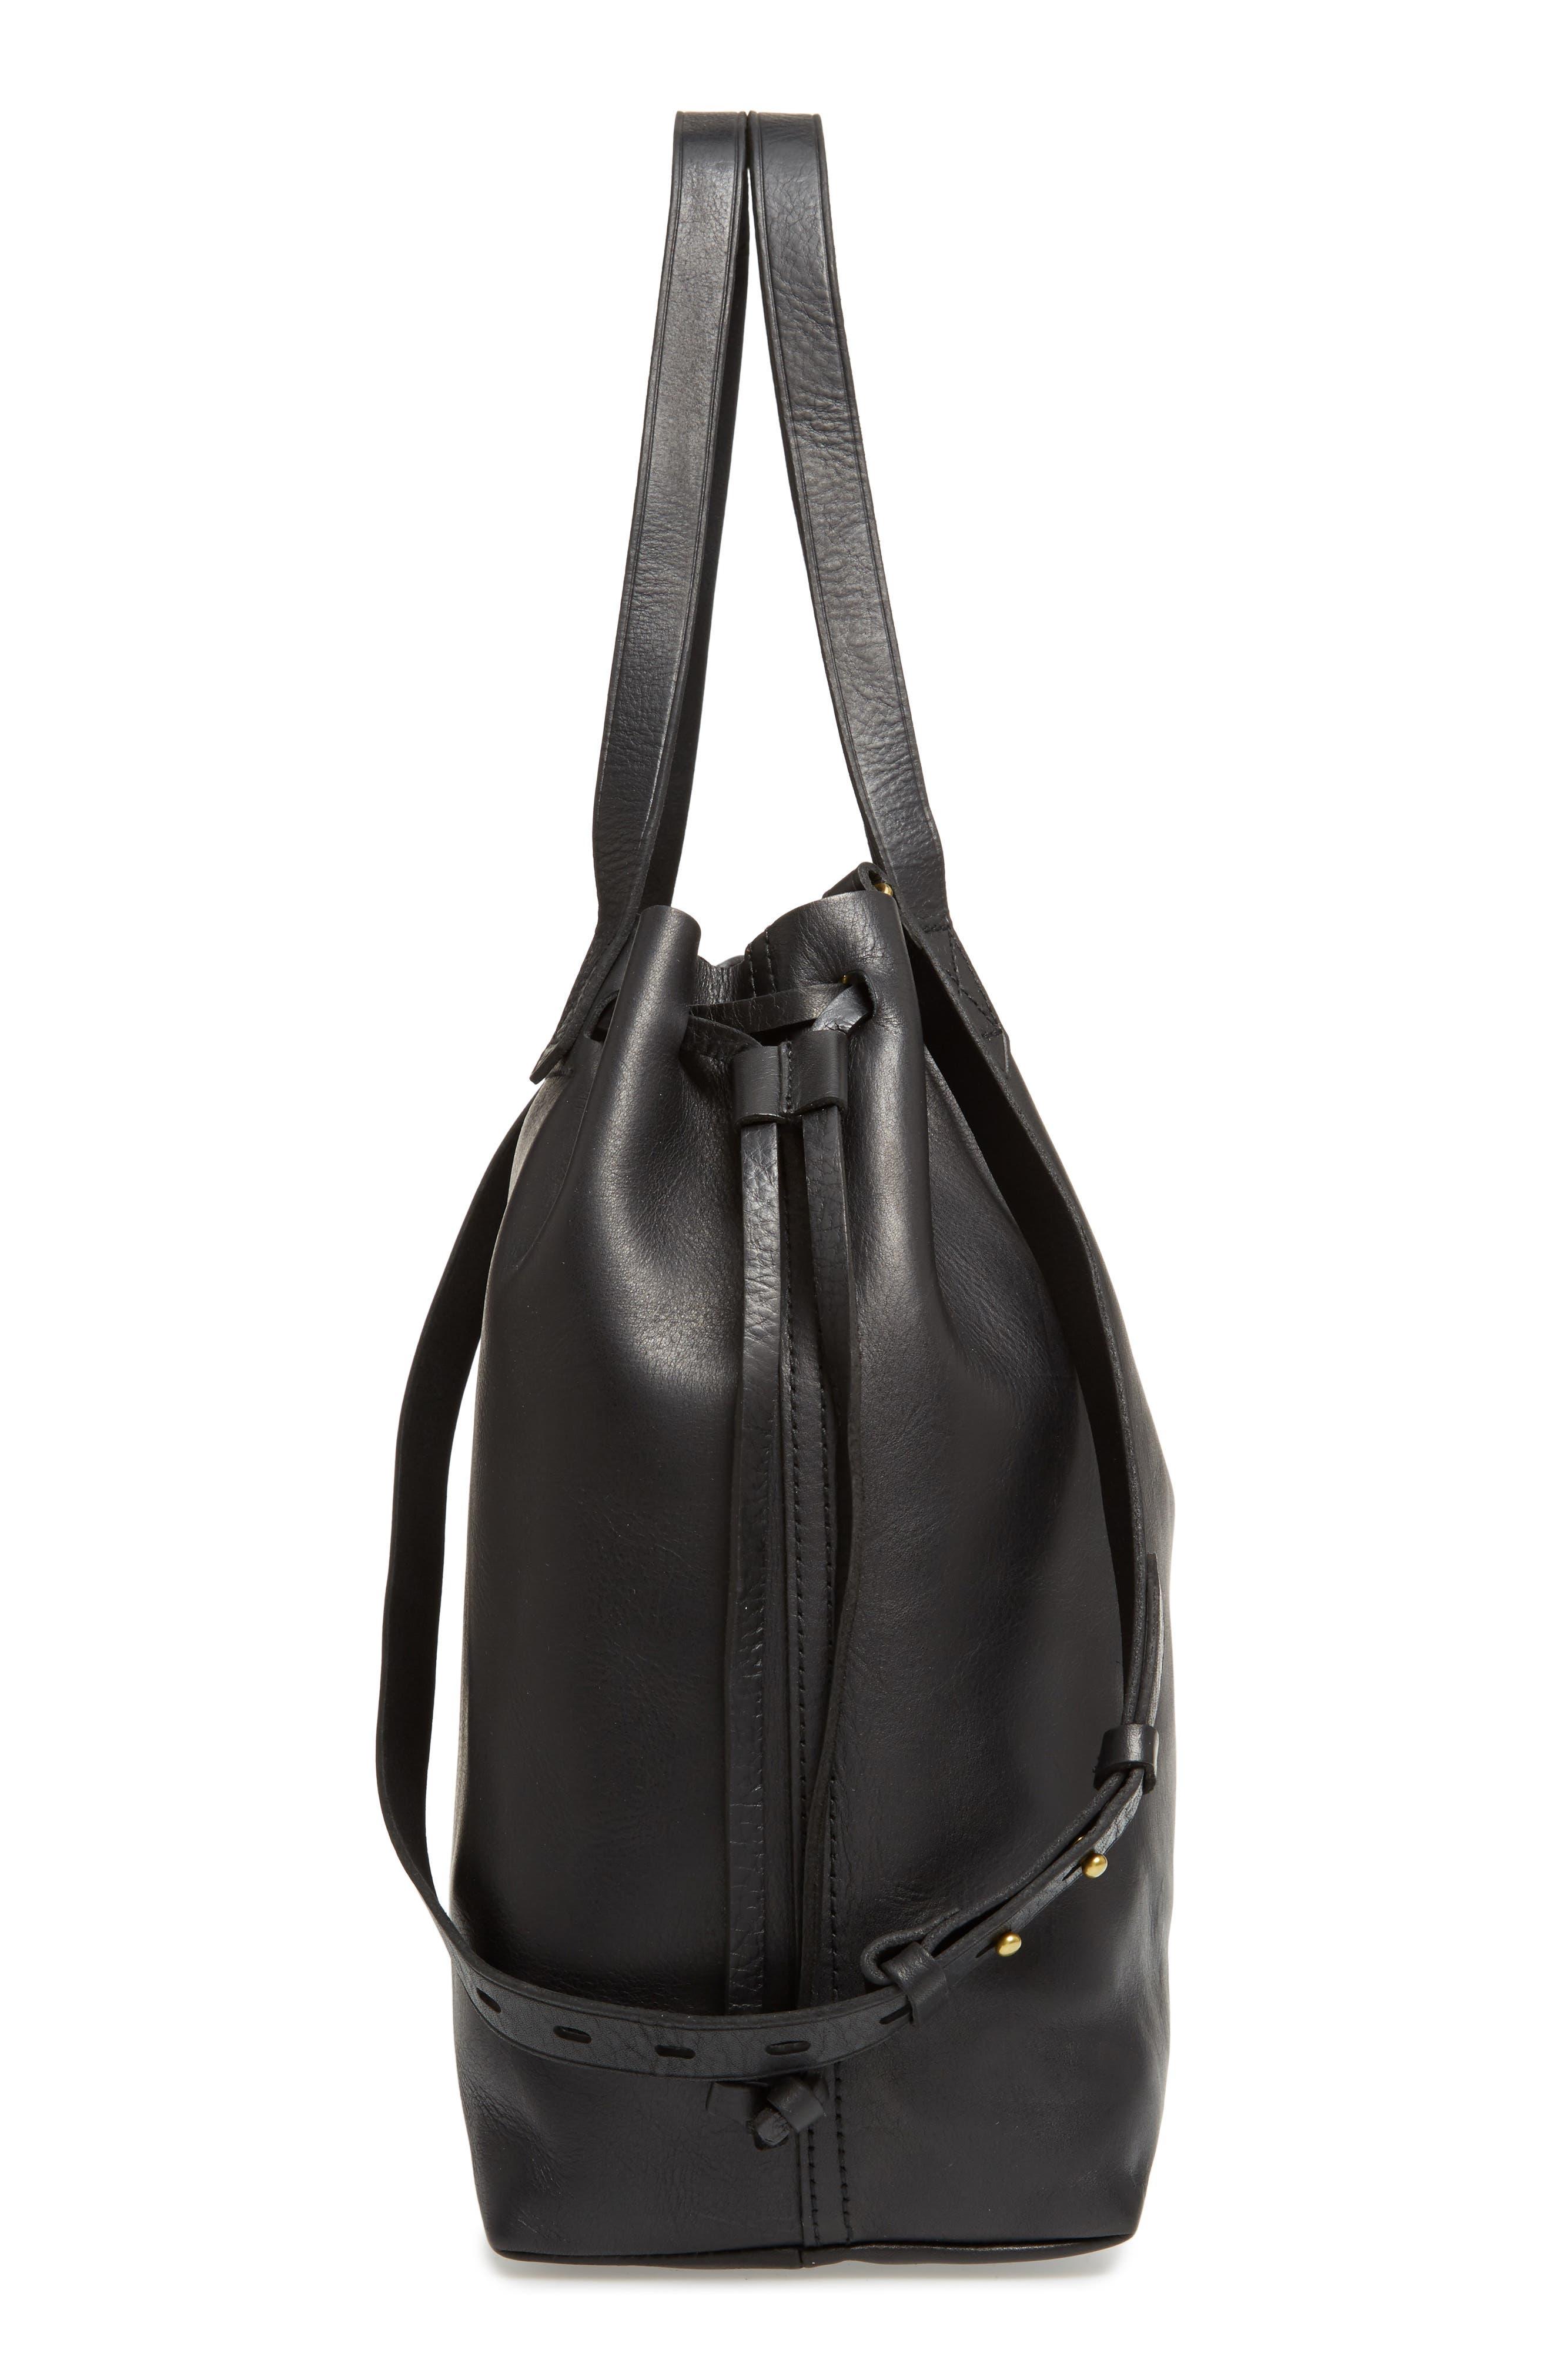 Medium Drawstring Transport Leather Tote,                             Alternate thumbnail 5, color,                             TRUE BLACK